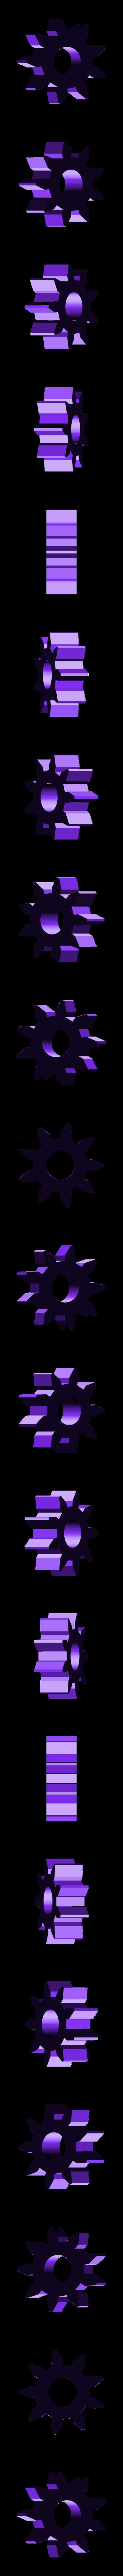 pot_gear2.stl Download free STL file Throttle / Pedal • 3D printer template, Job